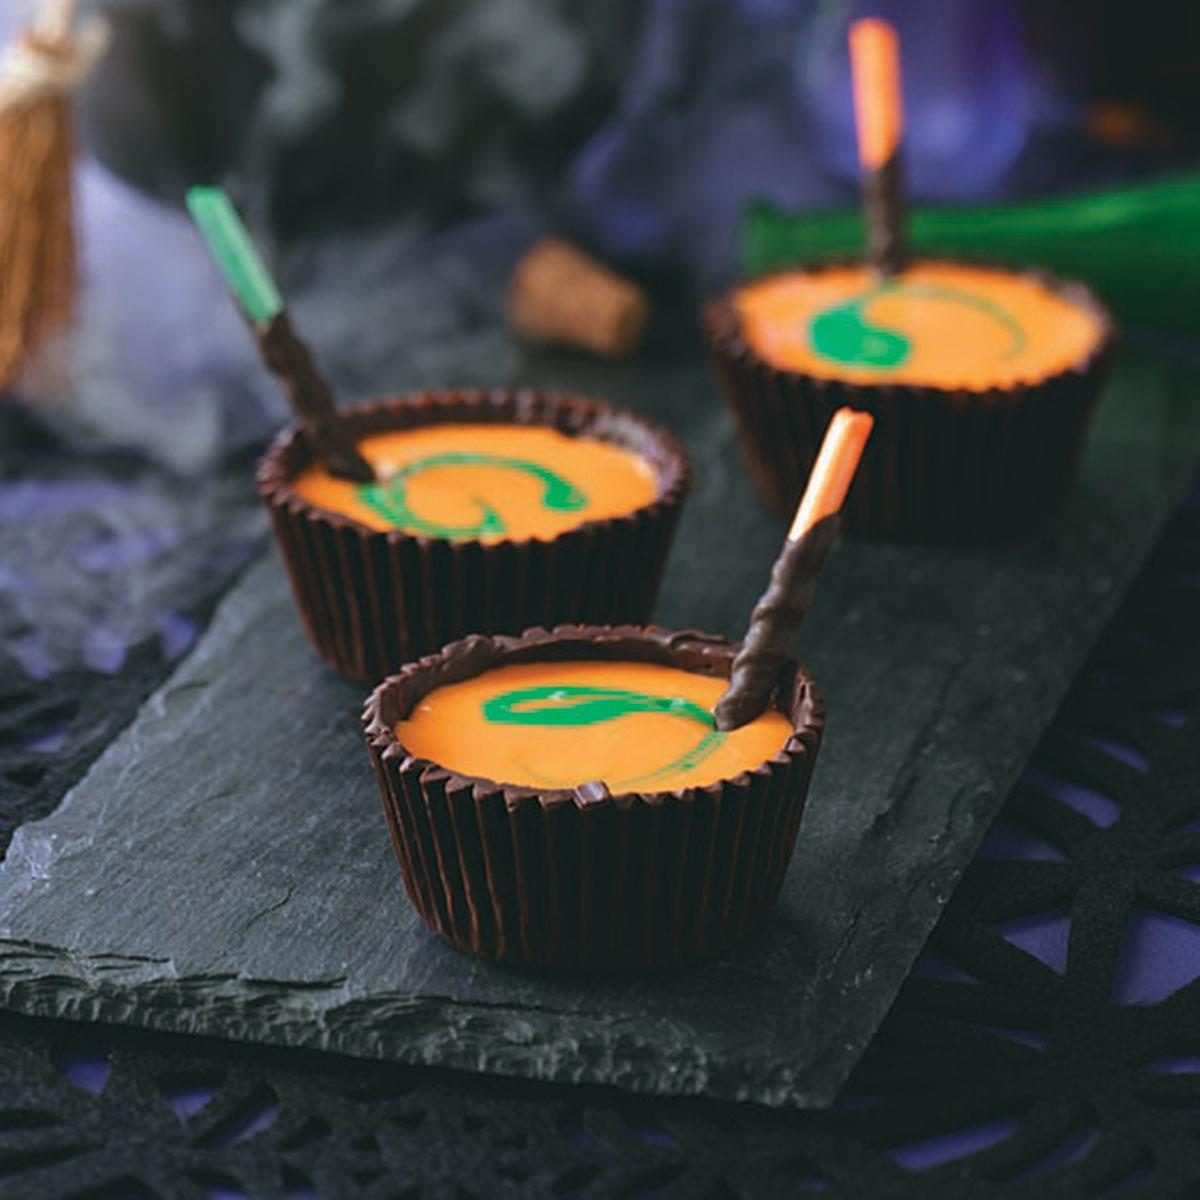 Yogurt-Filled Chocolate Cauldrons